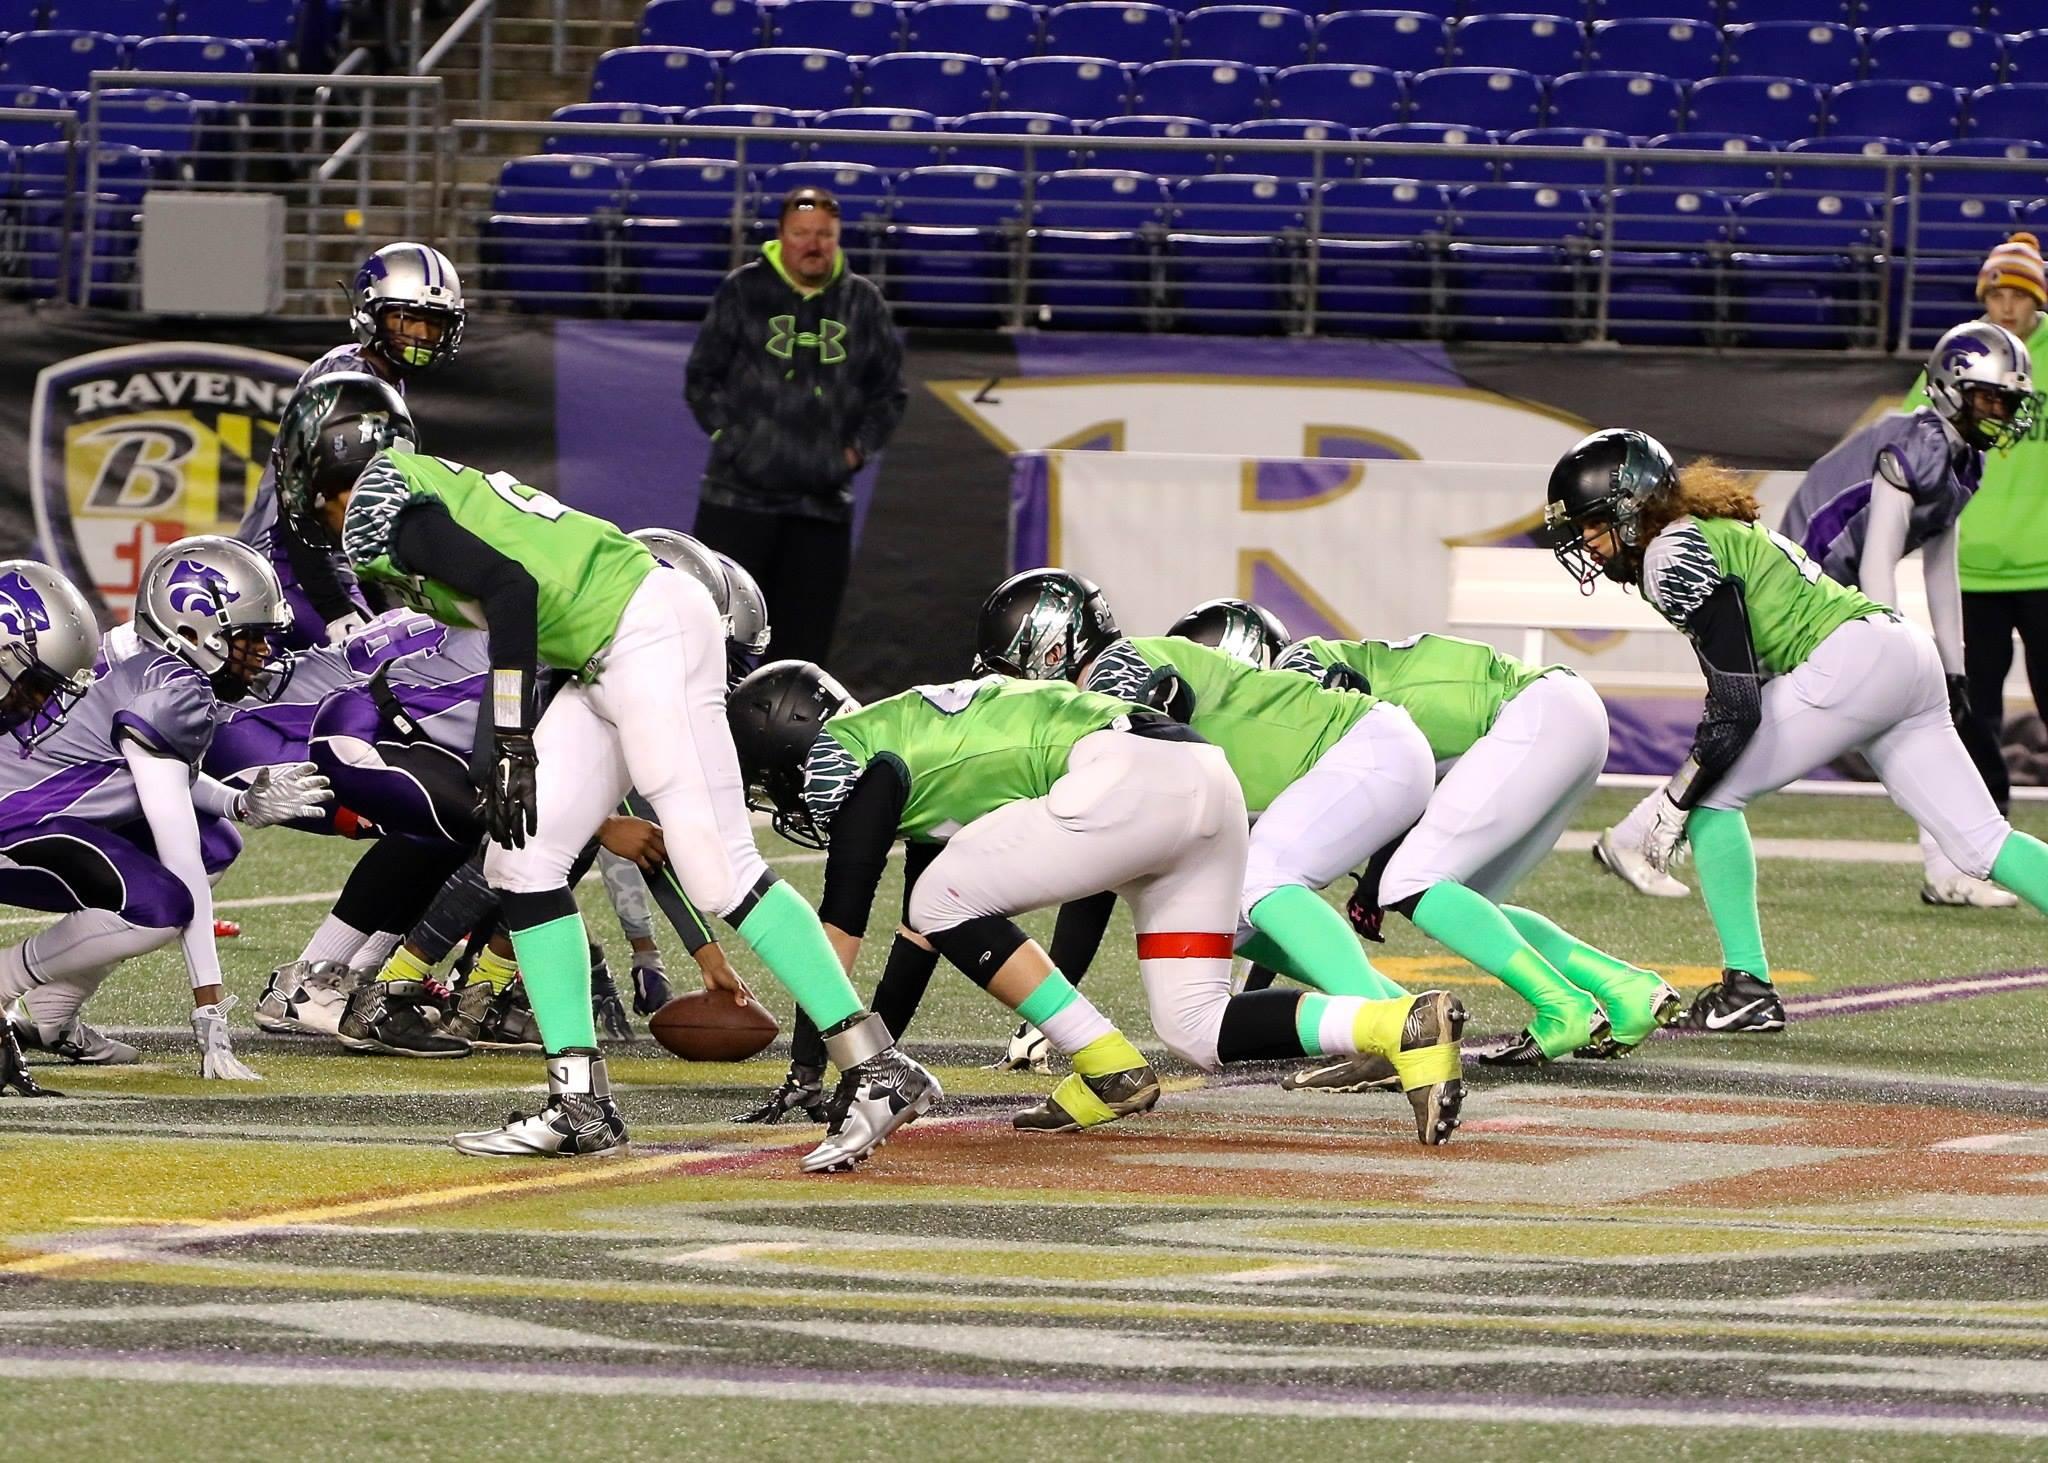 Prince Frederick Eagles - Maryland State Championships at Ravens Stadium